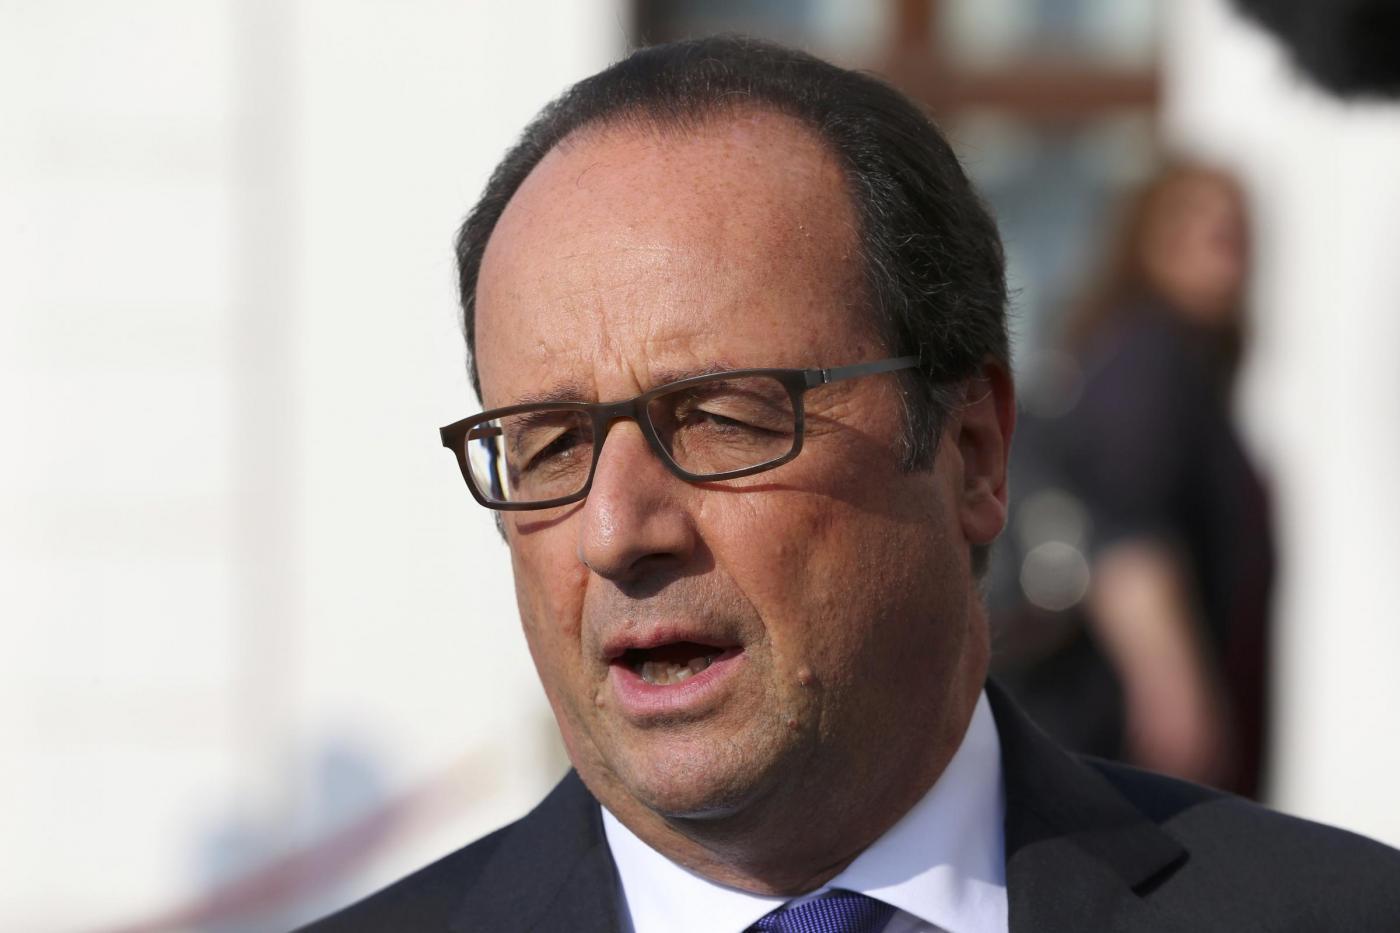 Il presidente francese Francois Hollande al summit EU di Bratislava